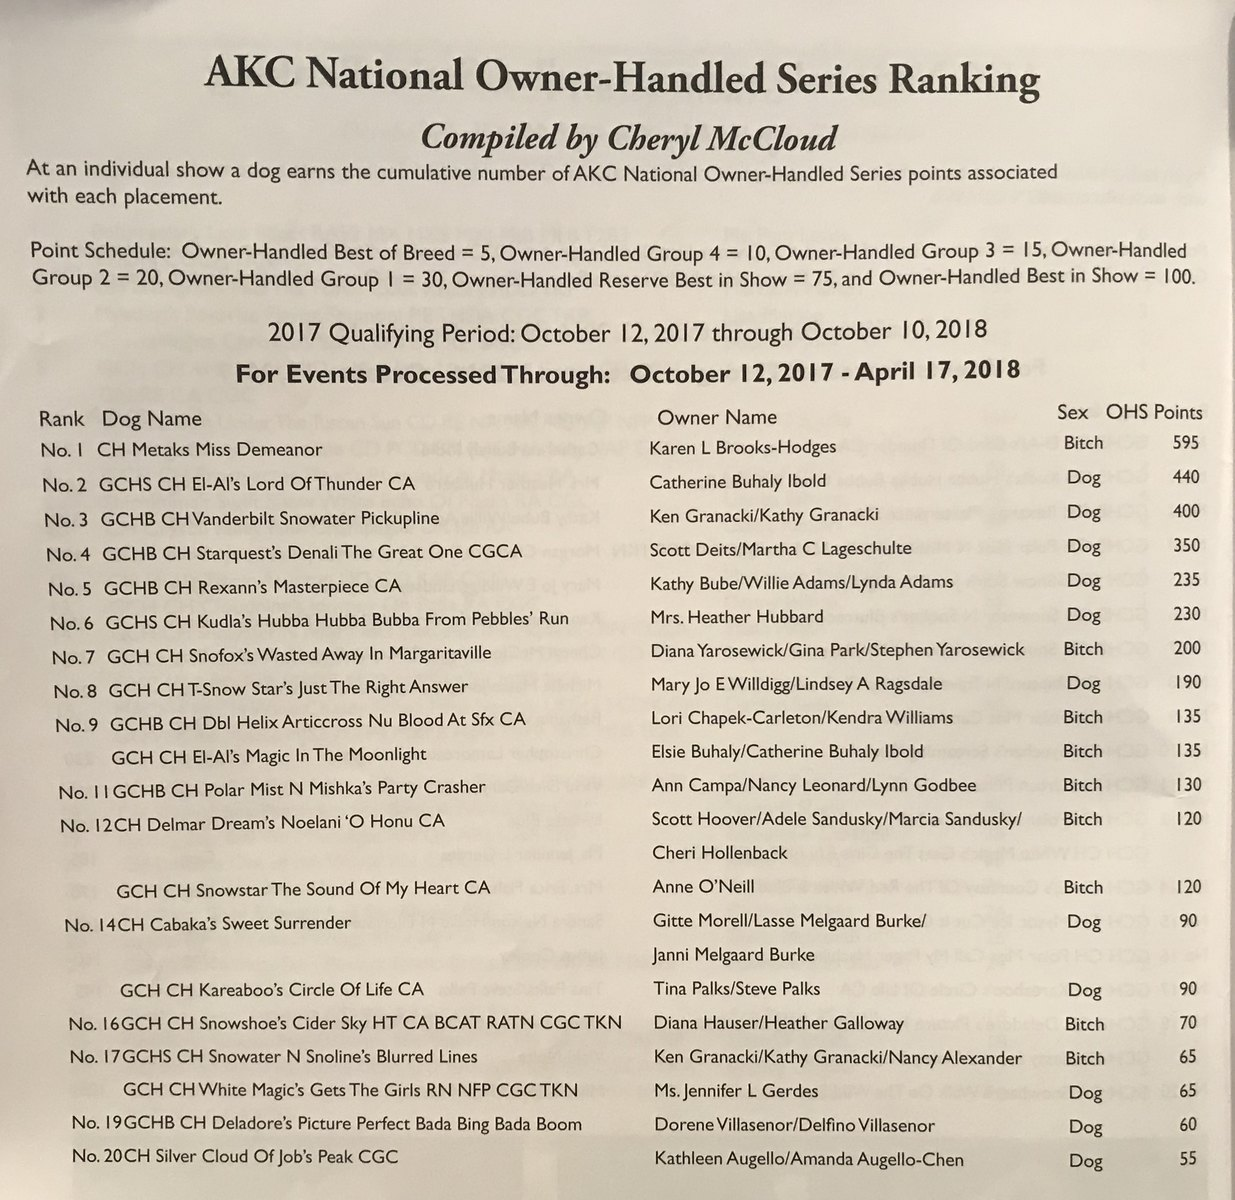 "MIINA - 2018 RANKED #1 IN AKC'S ""NATL OWNER-HANDLED SERIES"""